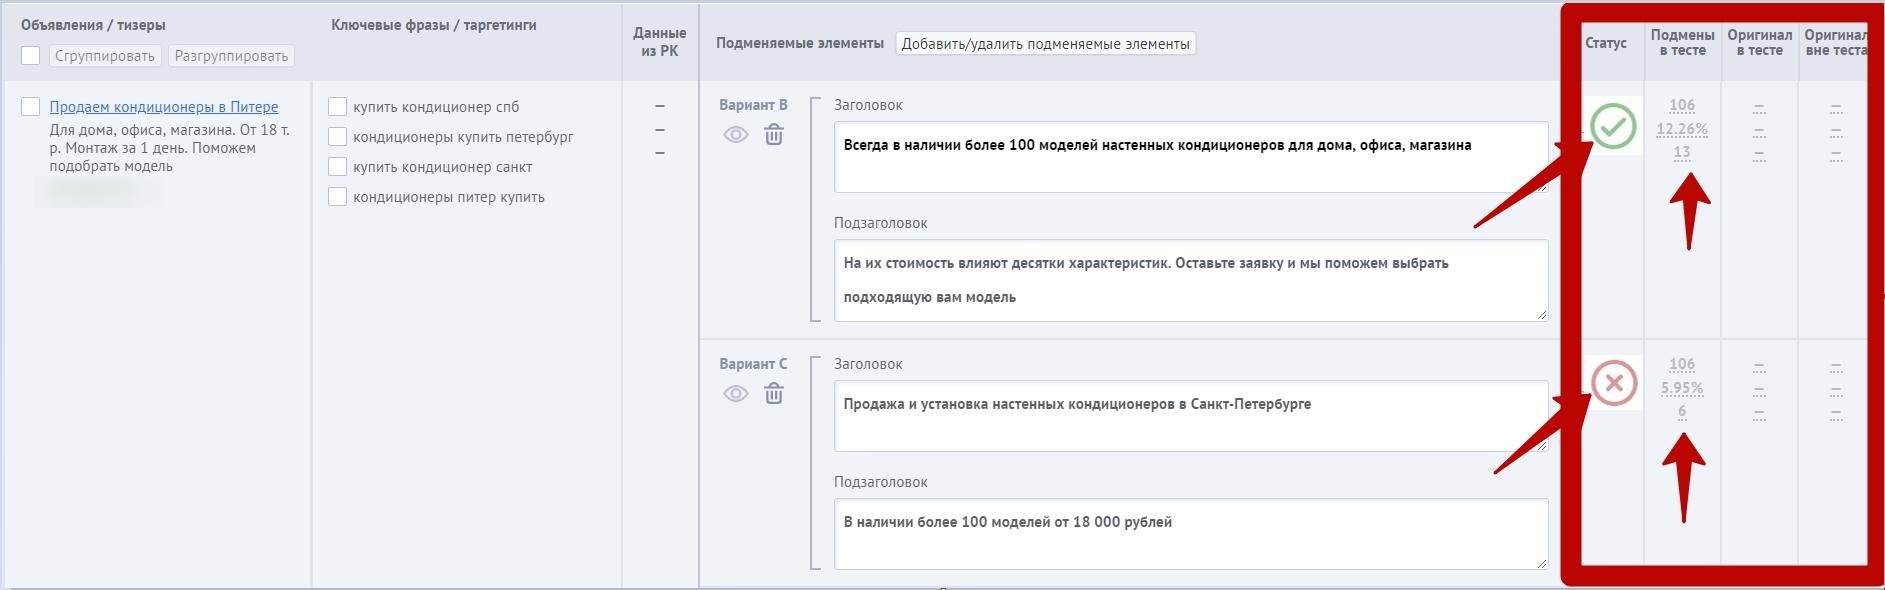 Настройка и оптимизация ретаргетинга в Яндекс.Директ – сравнение конверсий оригинала и подменяемого контента